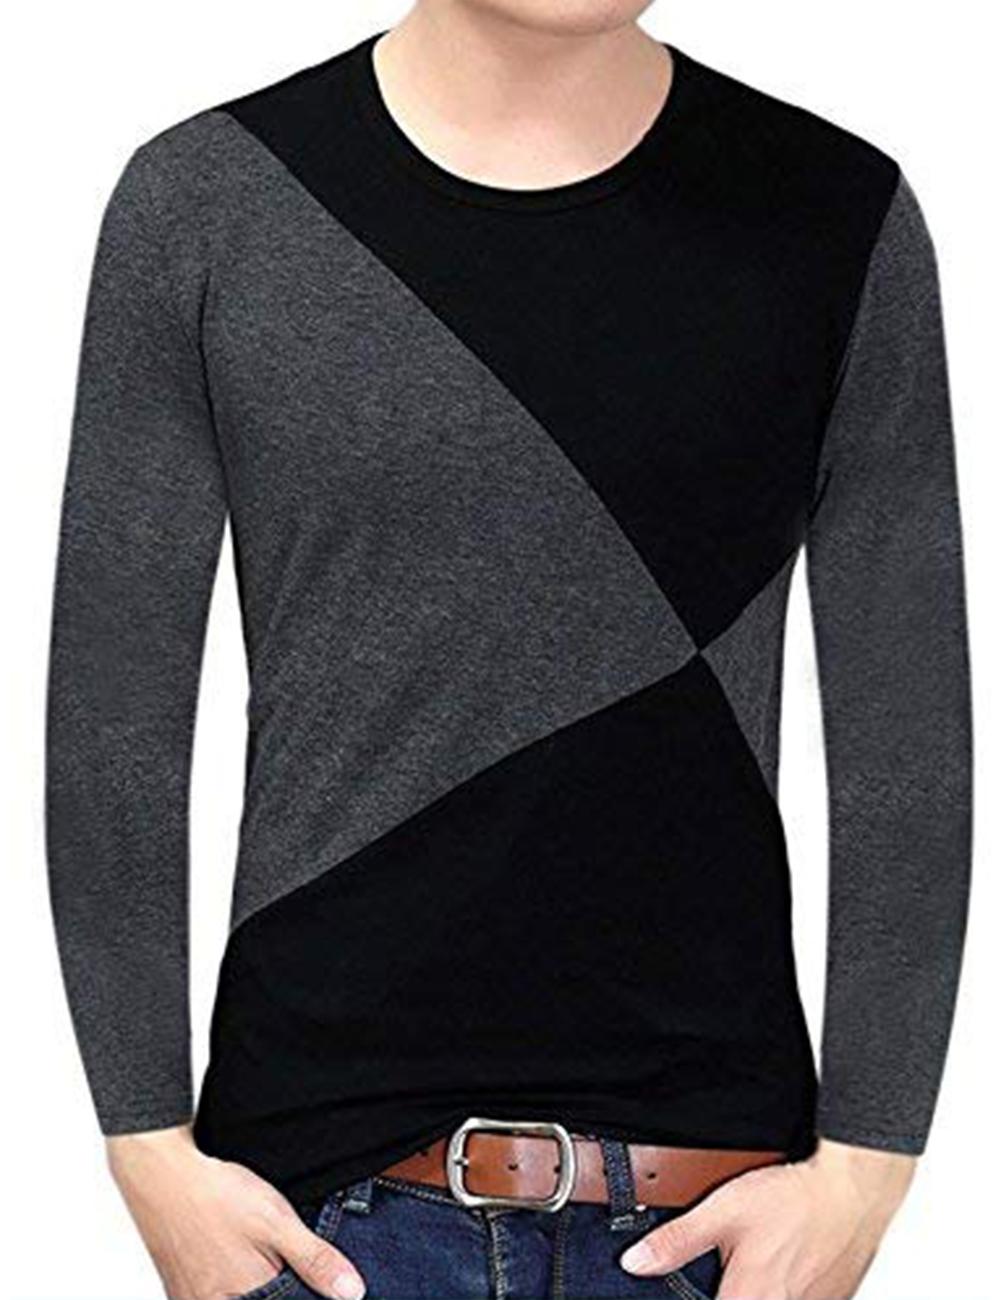 Yong Horse Men's Contrast Color Crew Neck Long Sleeve Basic T-Shirt Top Black-grey_M